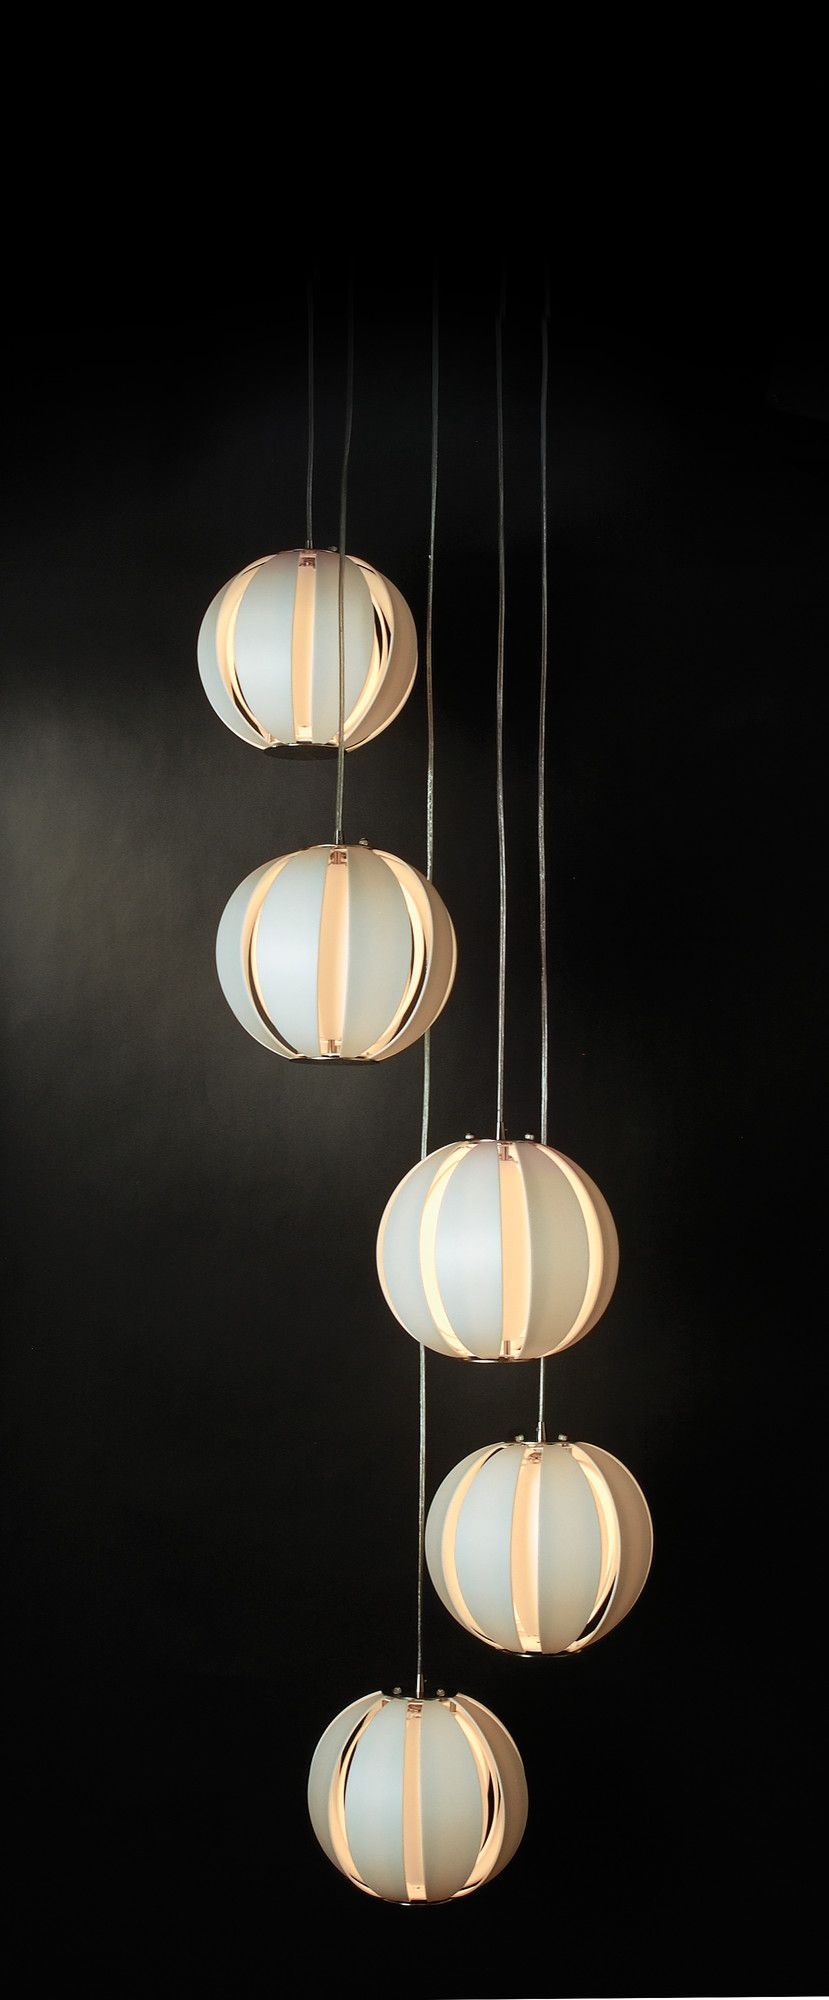 Pique light pendant wayfair home lighting interior